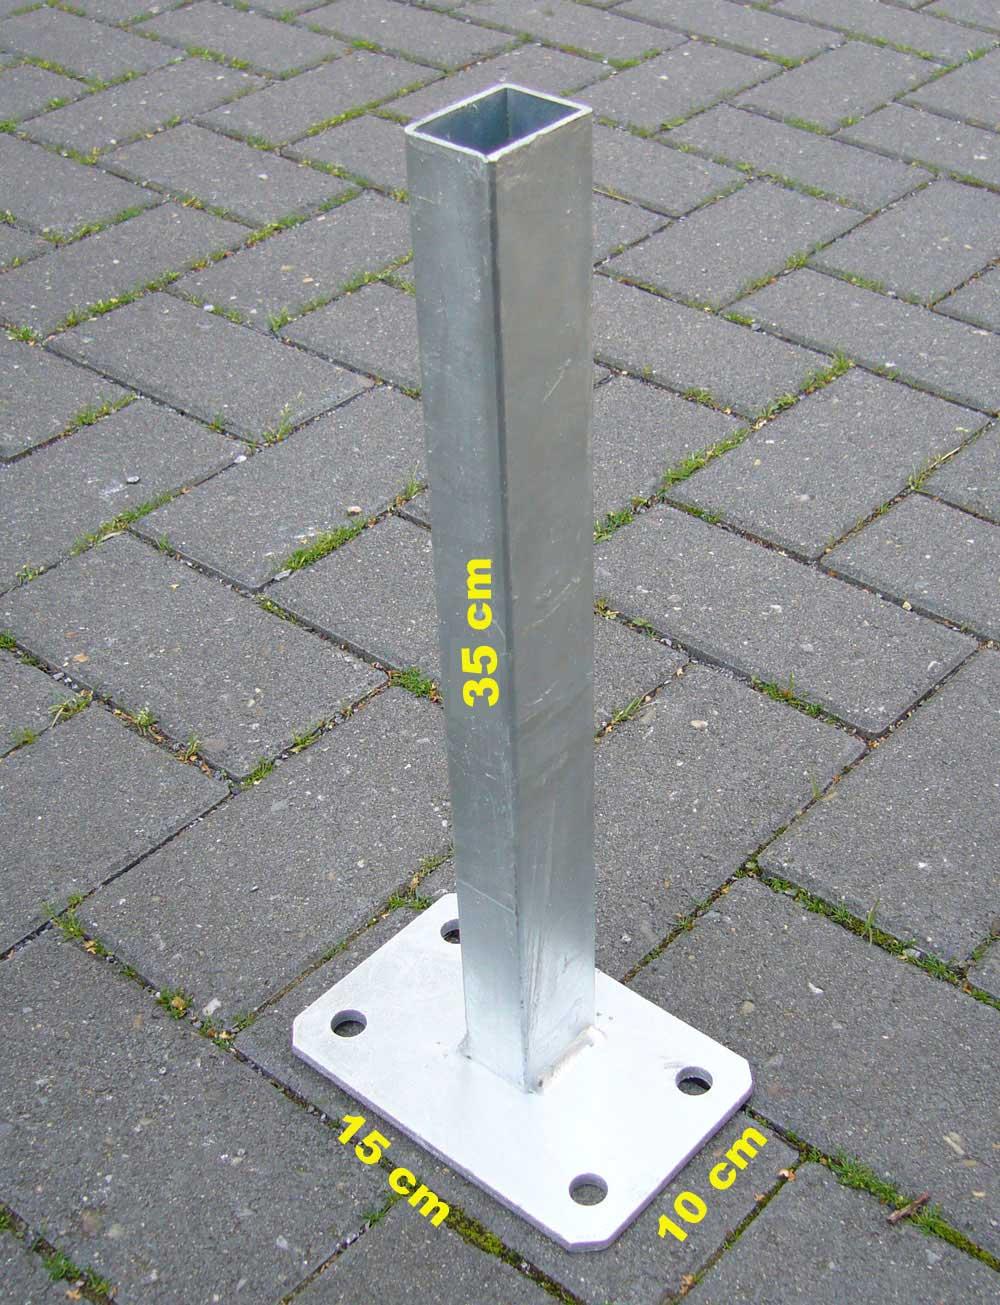 Fussplatte Fur Zaunpfosten 60 X 40 Mm Feuerverzinkt Gartenzaun